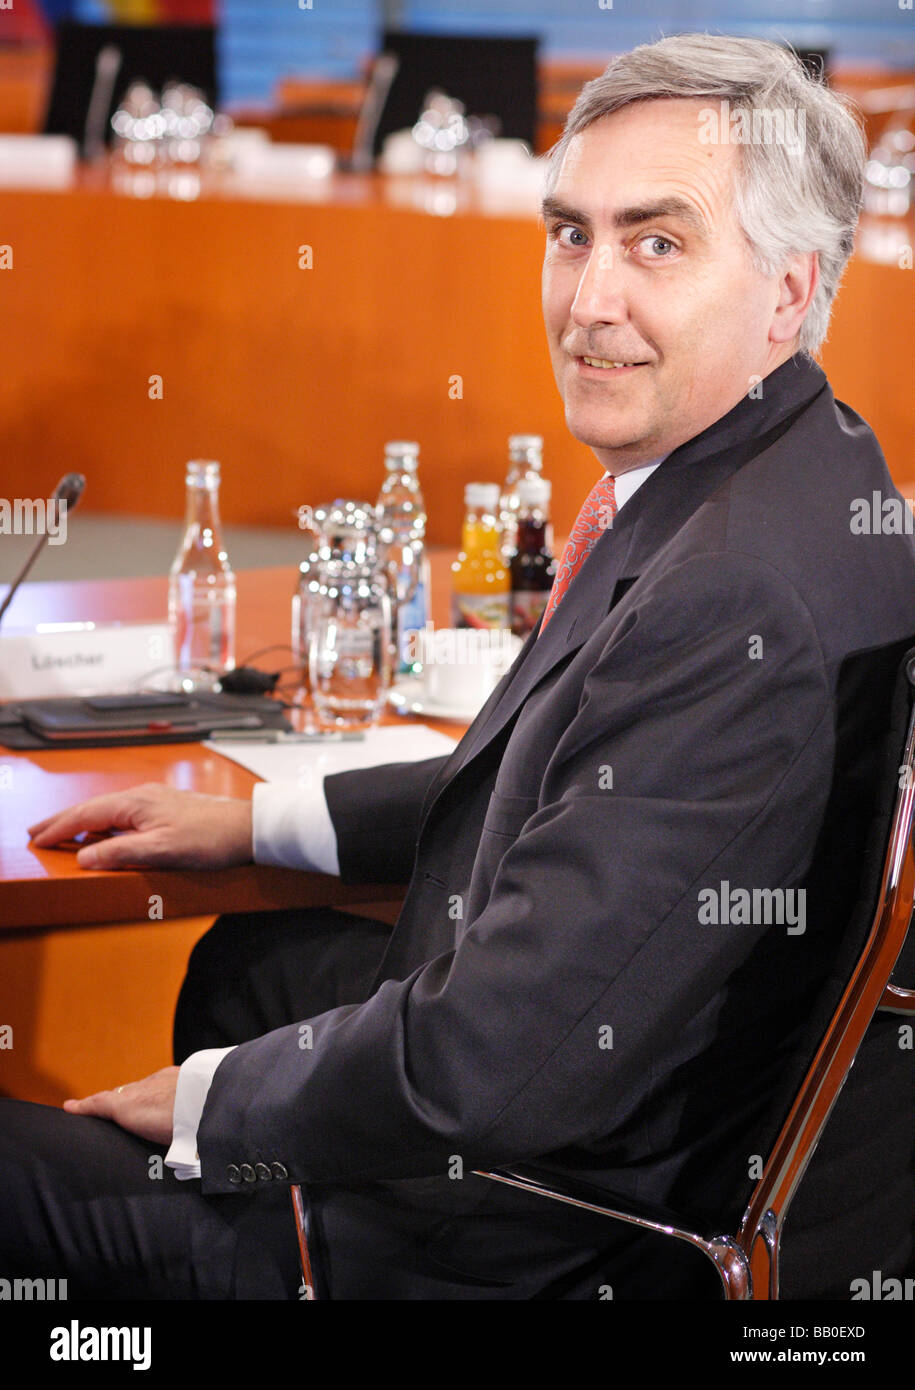 Peter LOESCHER CEO of Siemens A - Stock Image